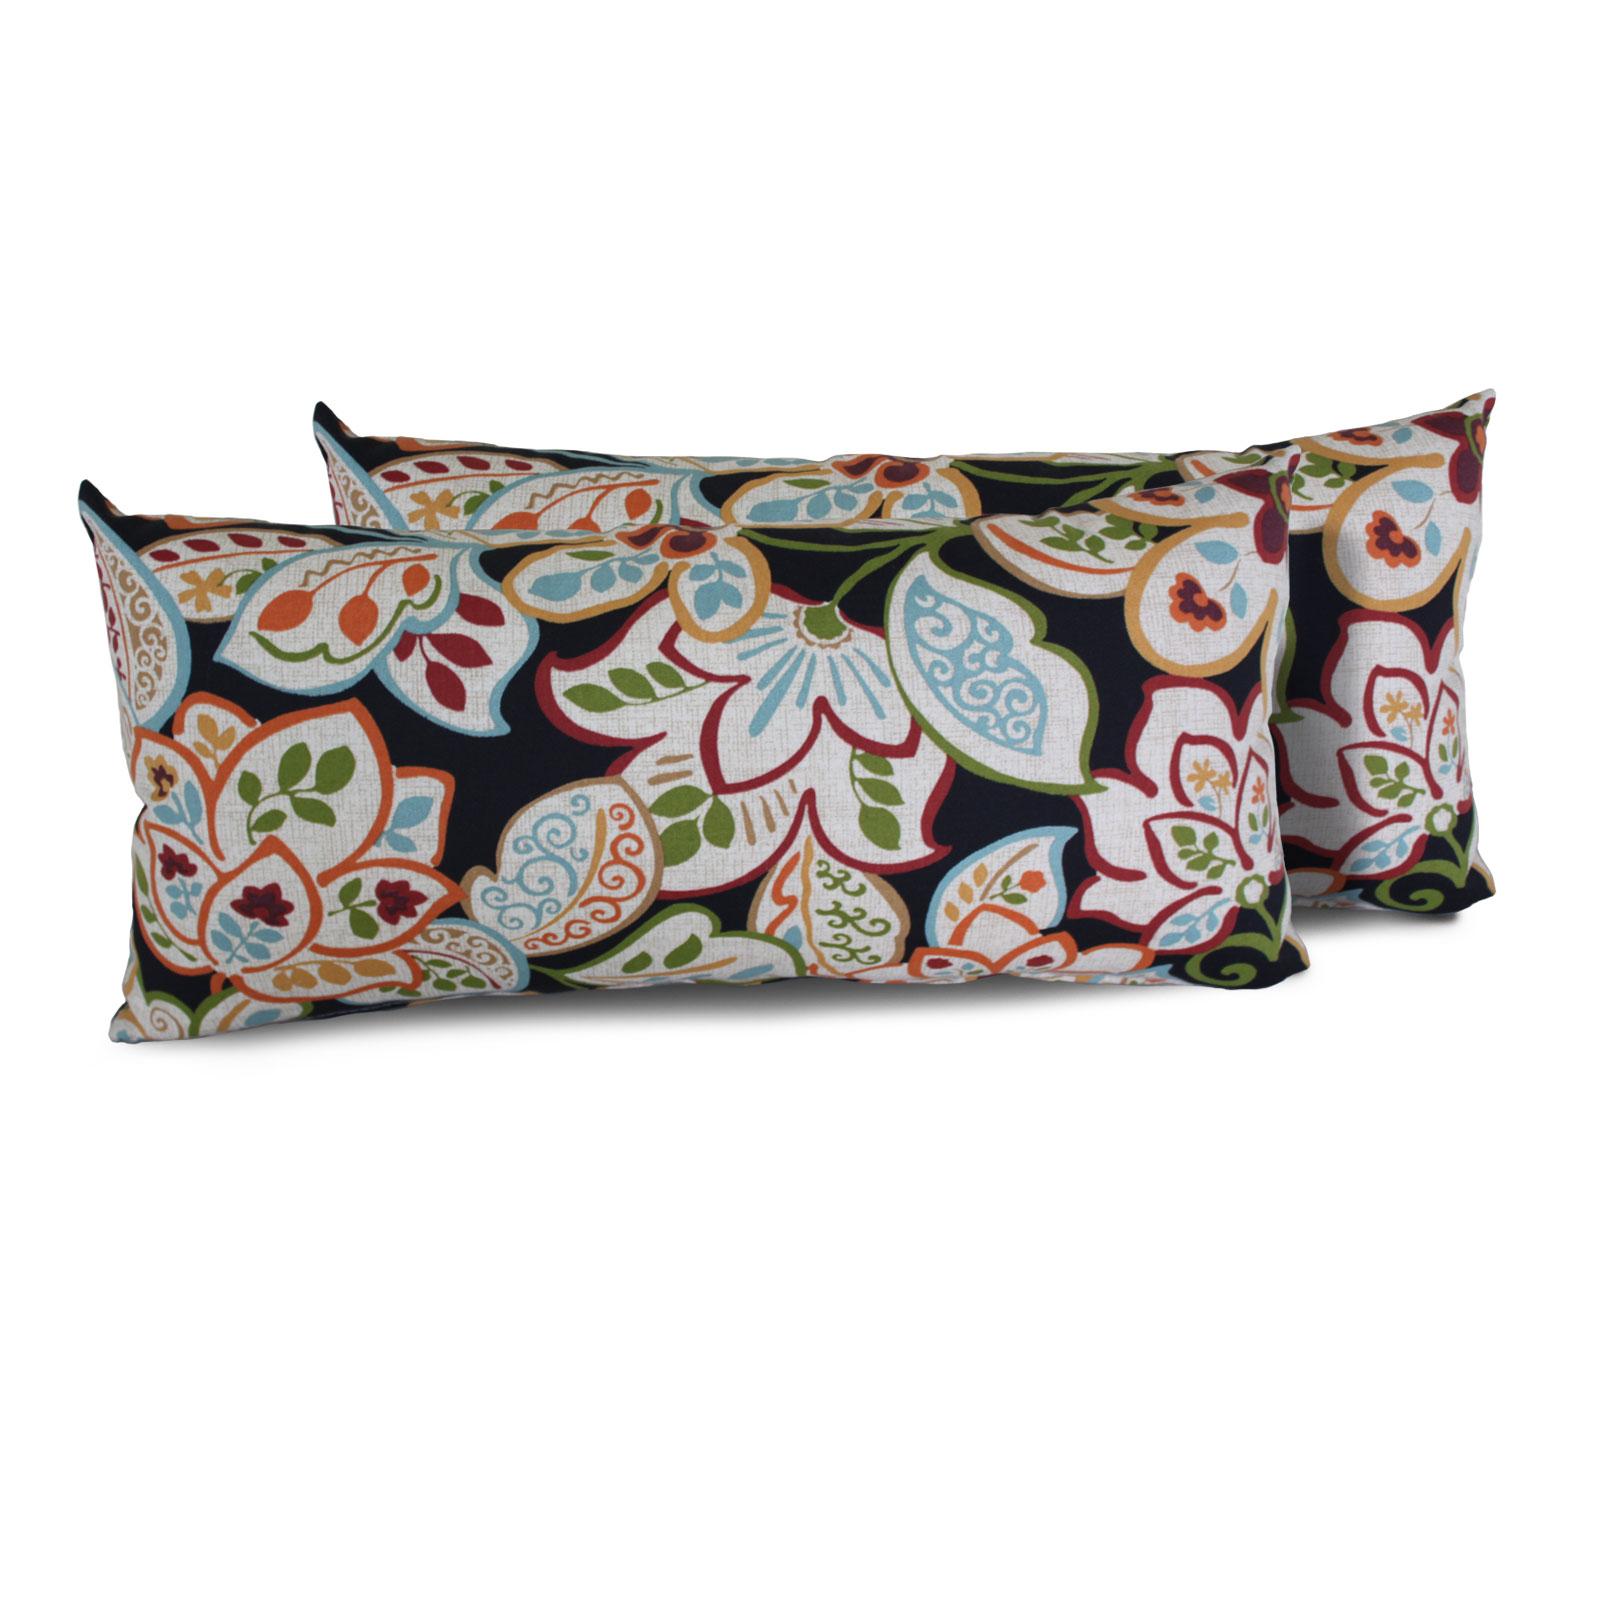 tk classics  villa floral outdoor throw pillows rectangle set of  - villa floral villa floral outdoor throw pillows rectangle set of